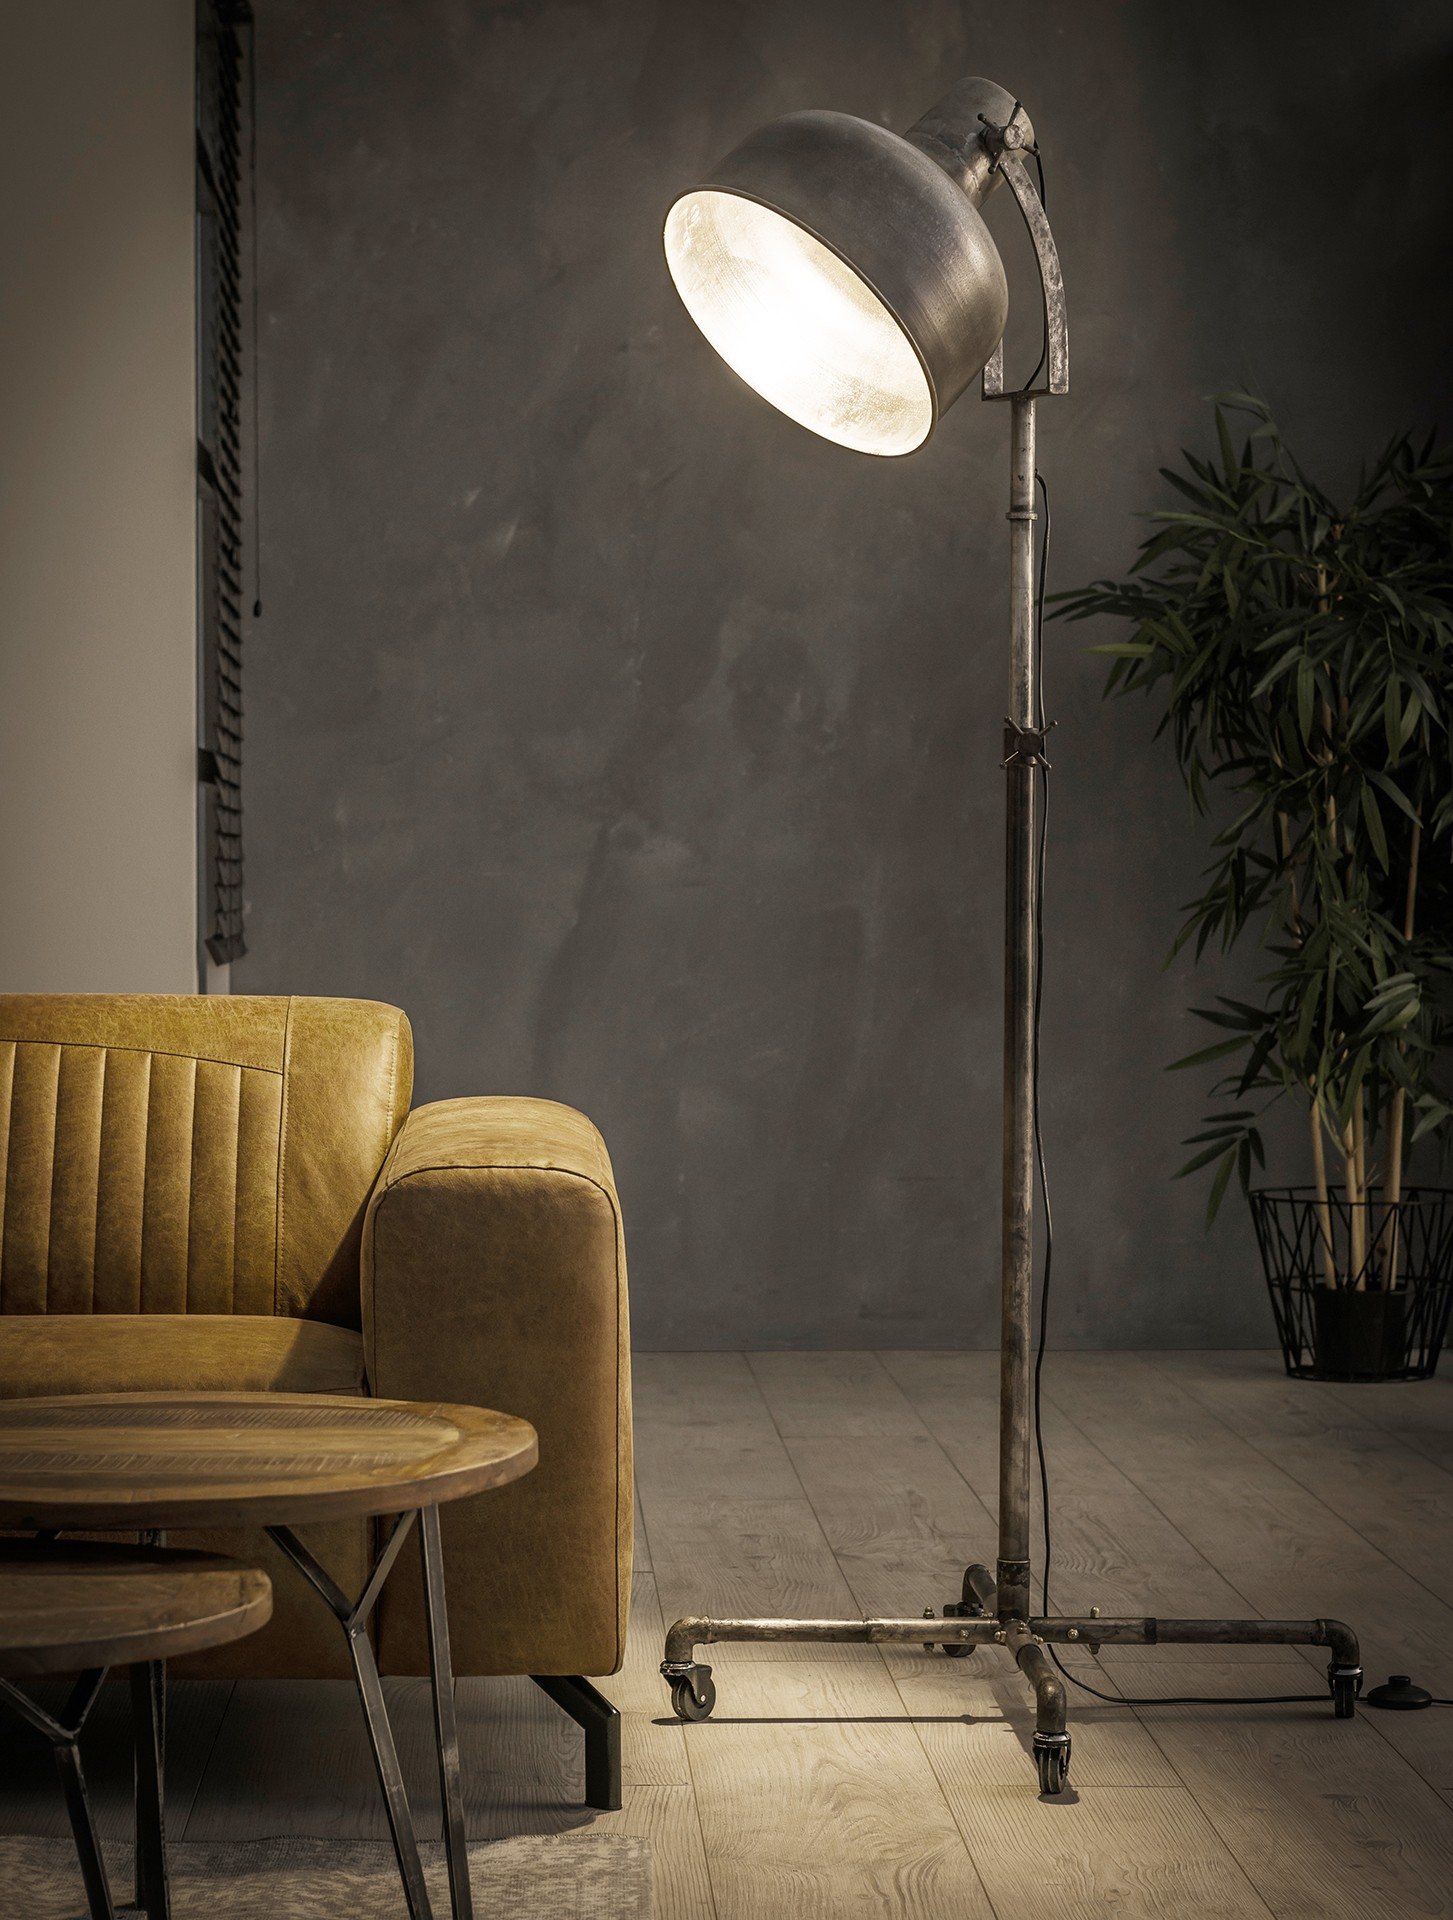 Vloerlamp industry op wieltjes - Oud zilver